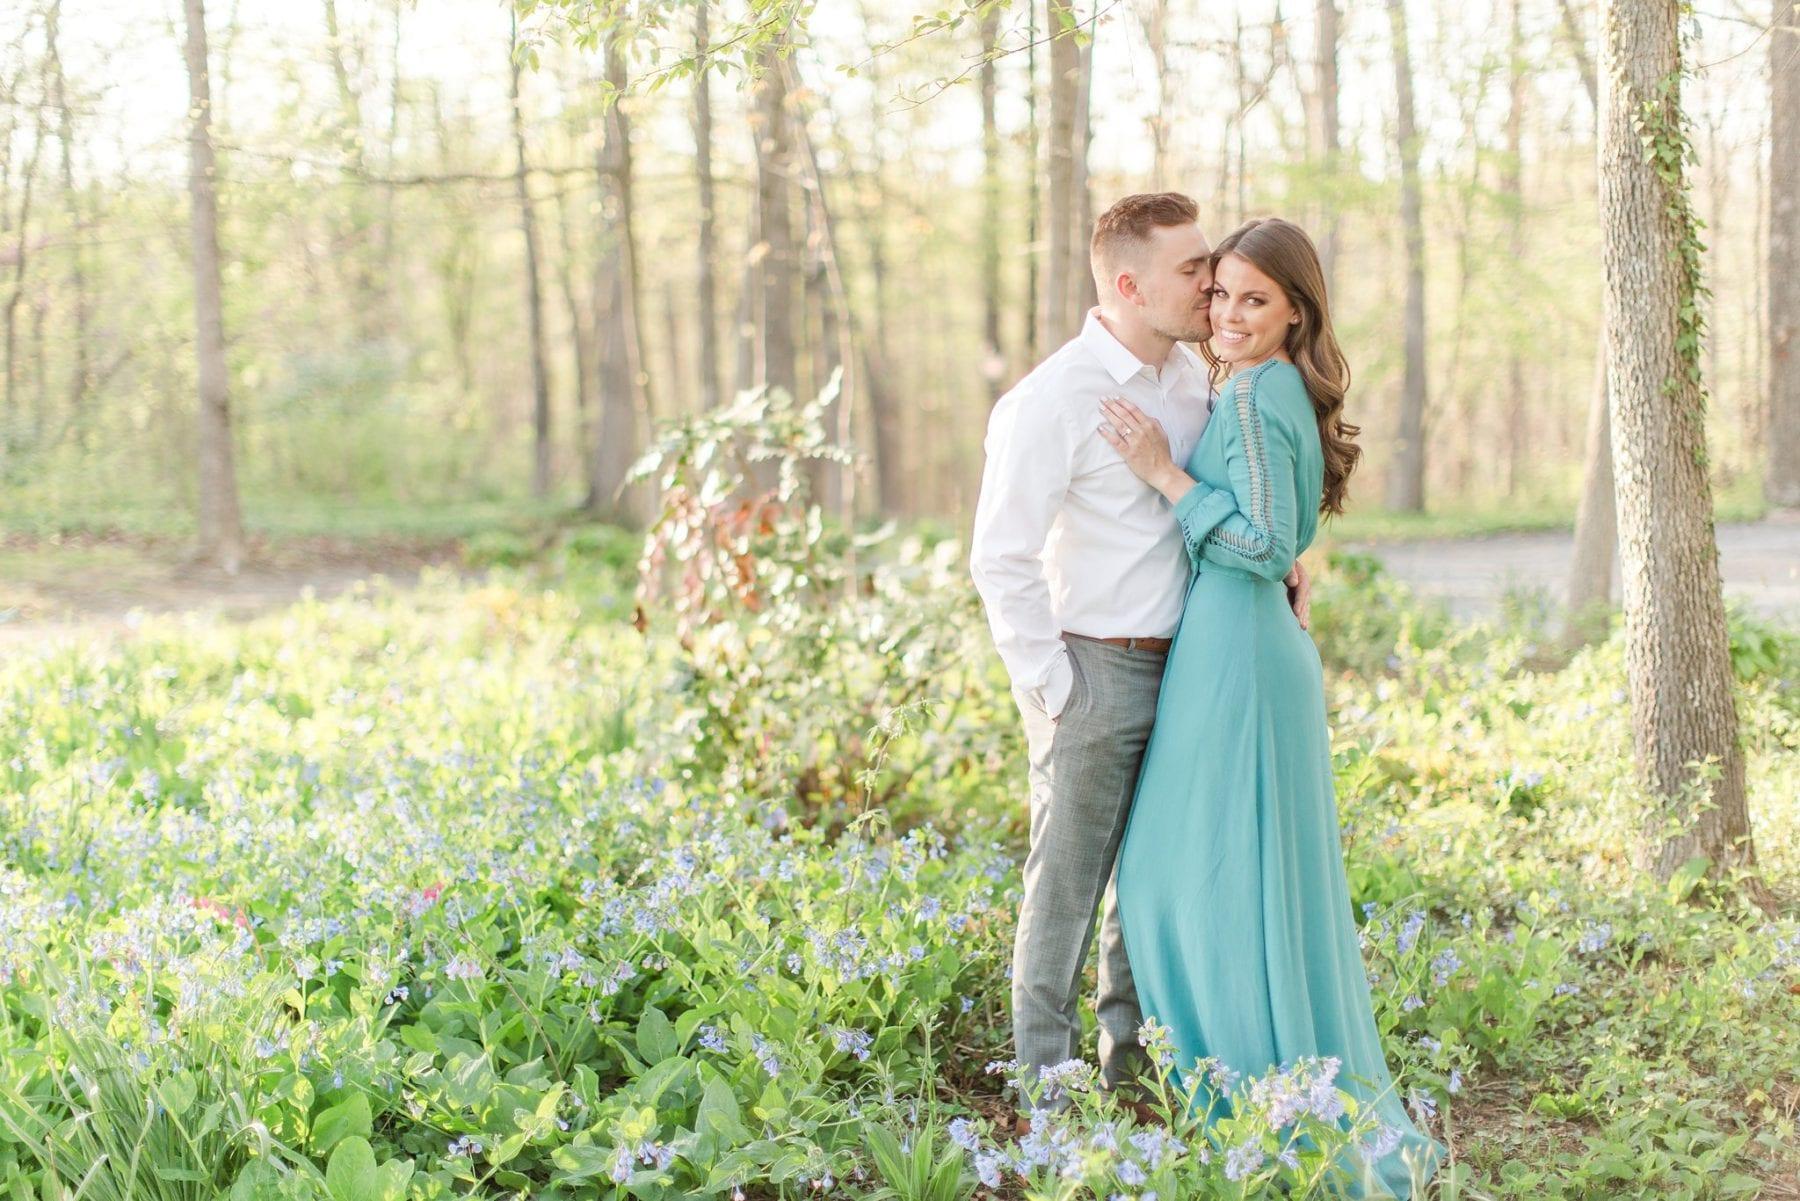 Goodstone Inn Engagement Session Virginia Wedding Photographer Megan Kelsey Photography-166.jpg